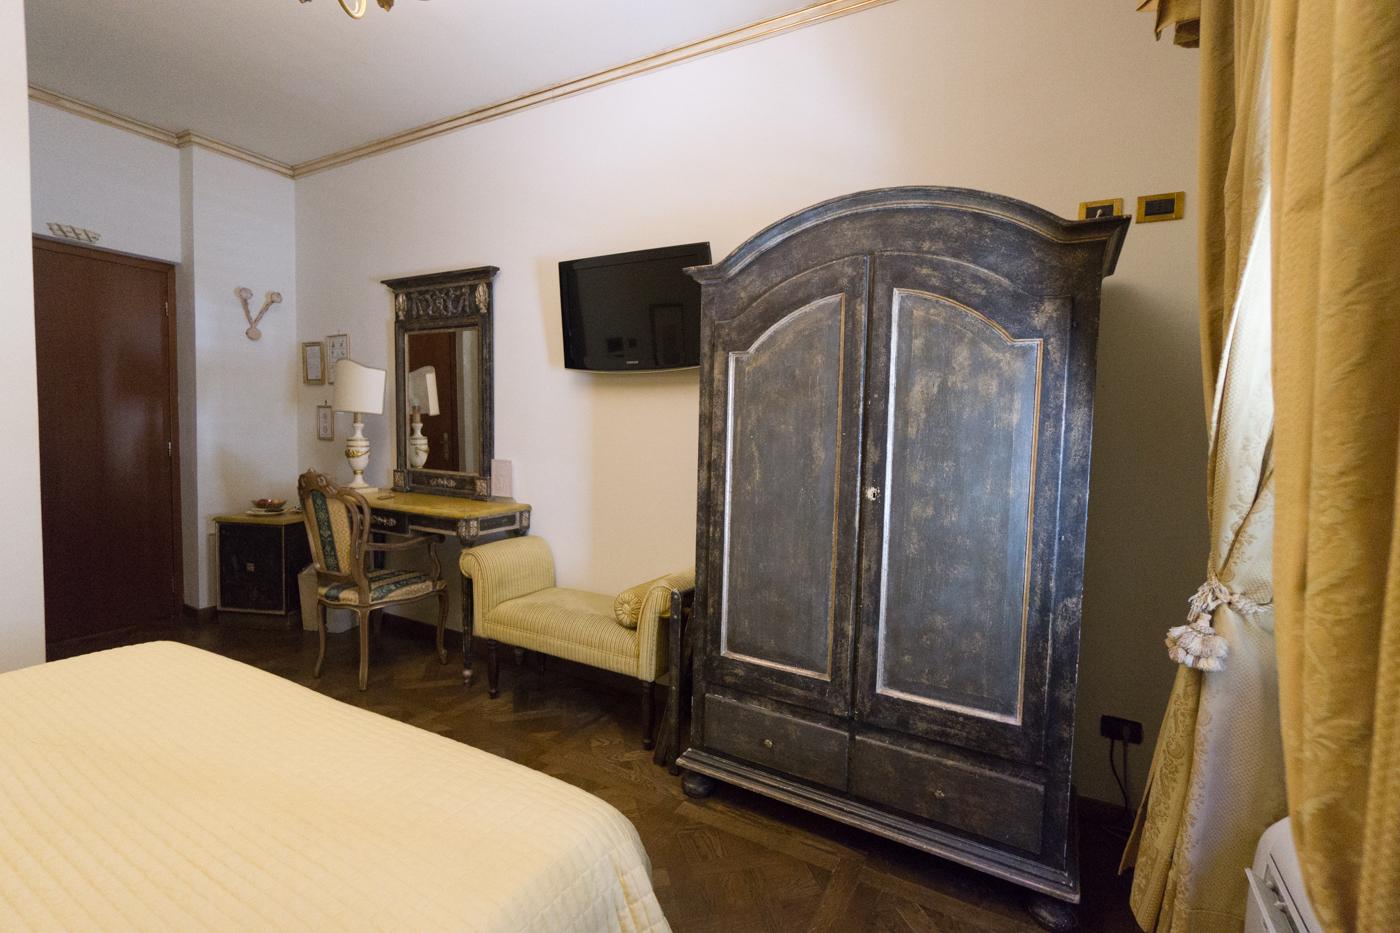 Où dormir à Lucca? Hotel Palazzo Alexander